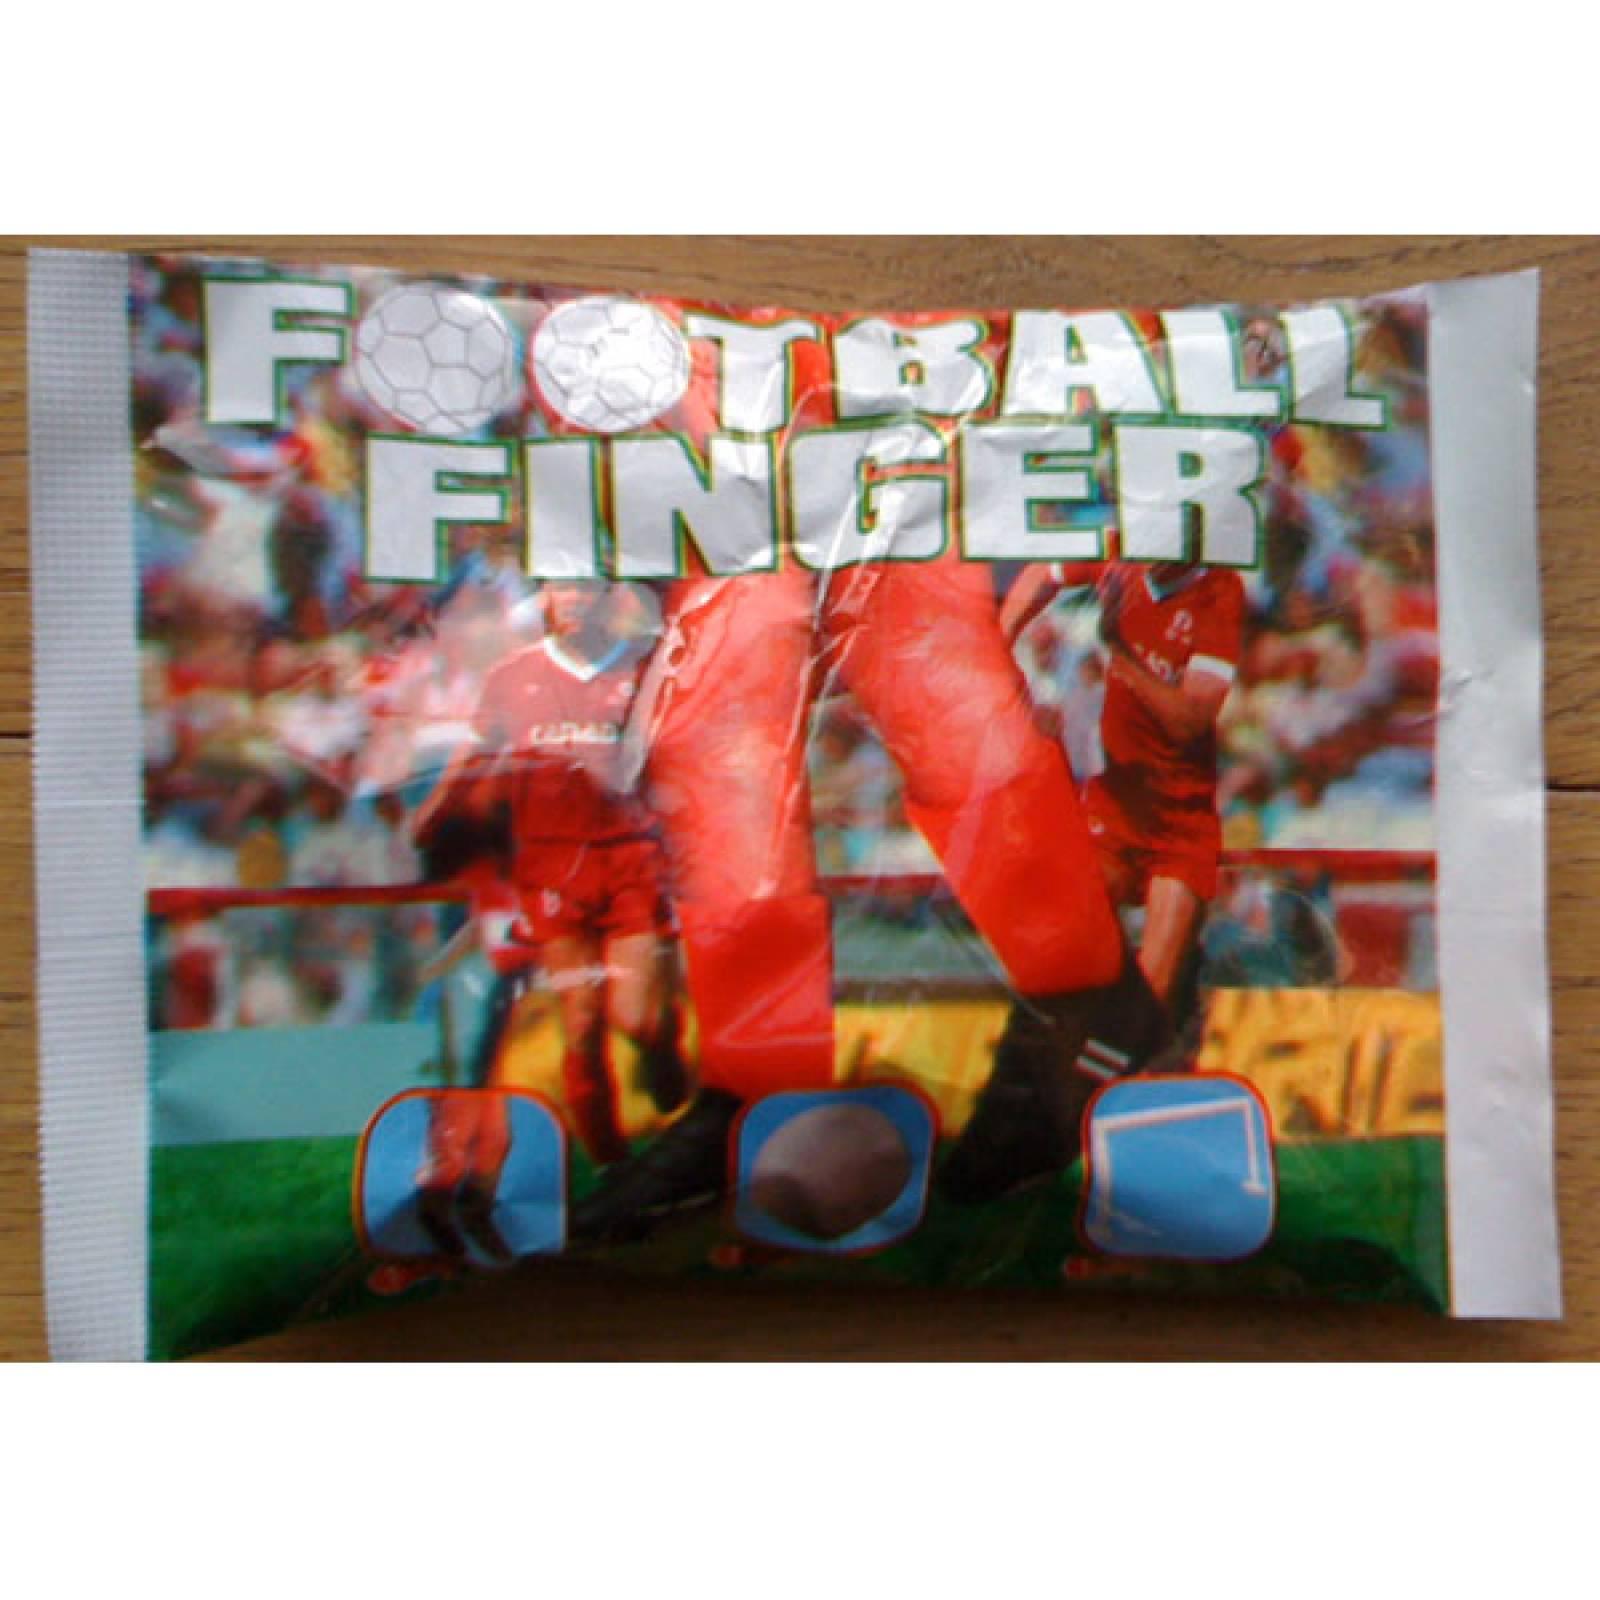 Finger Football thumbnails